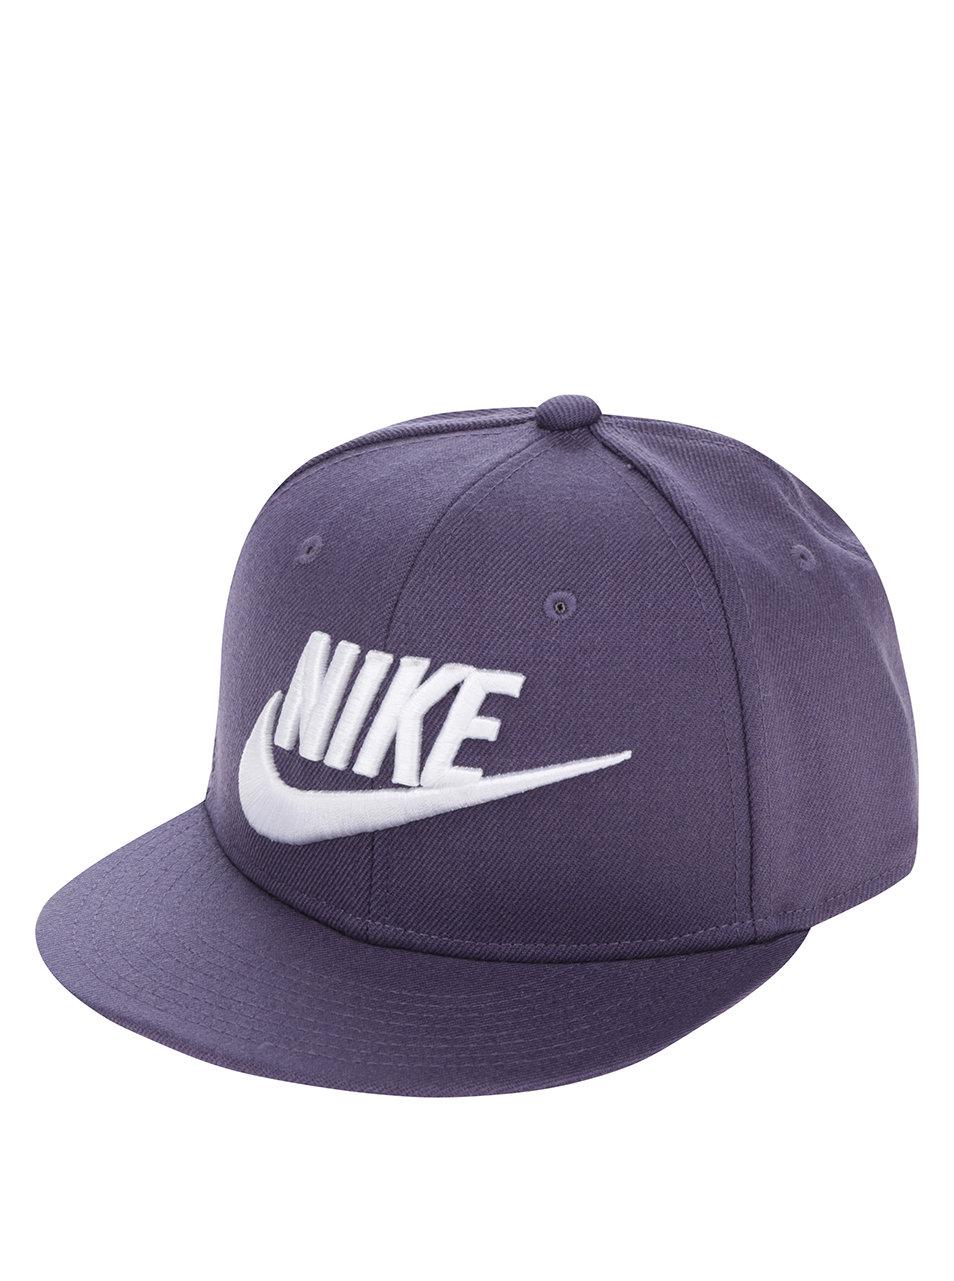 07afe5261 Fialová pánska šiltovka Nike | ZOOT.sk